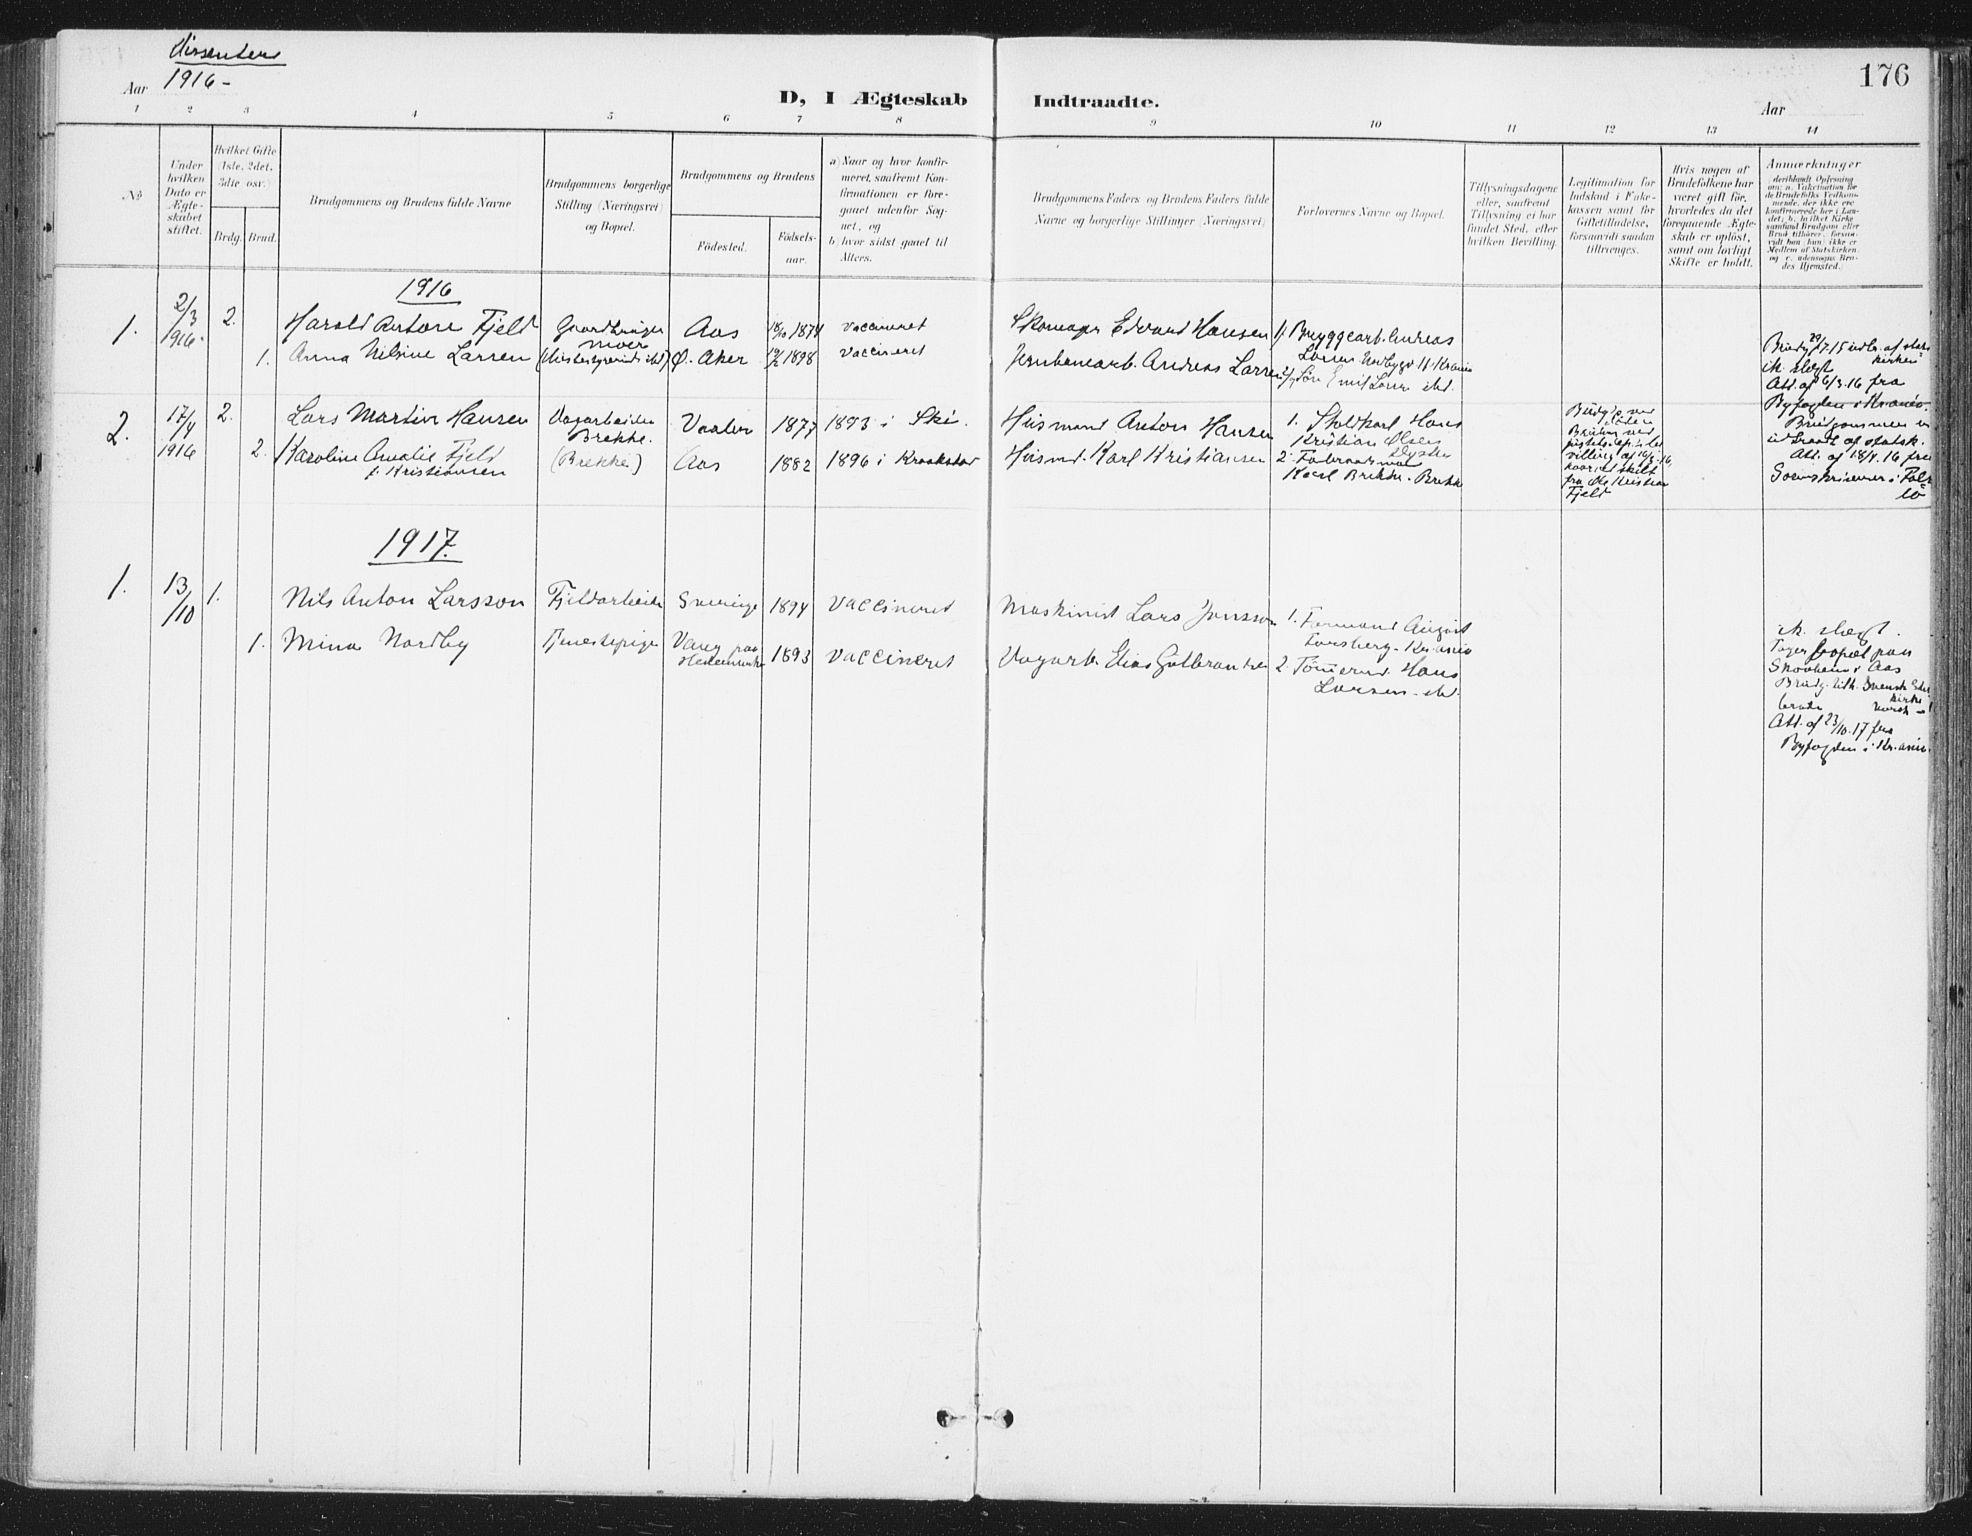 SAO, Ås prestekontor Kirkebøker, F/Fa/L0010: Ministerialbok nr. I 10, 1900-1918, s. 176